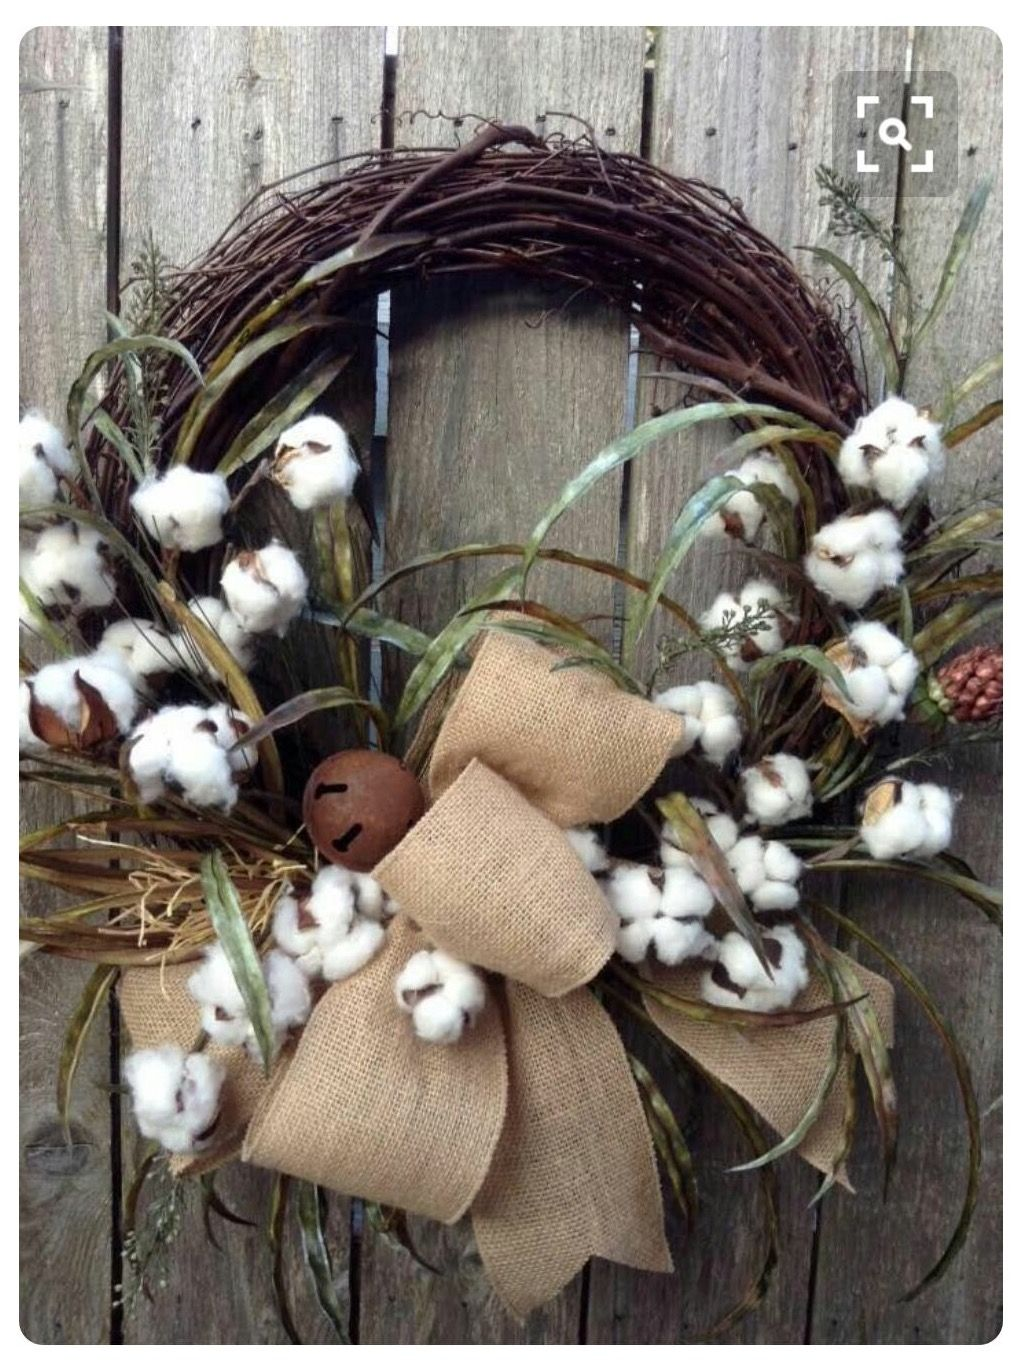 Pin By Brenda Phillips On Grapevine Wreaths Cotton Boll Wreath Primitive Wreath Wreath Crafts